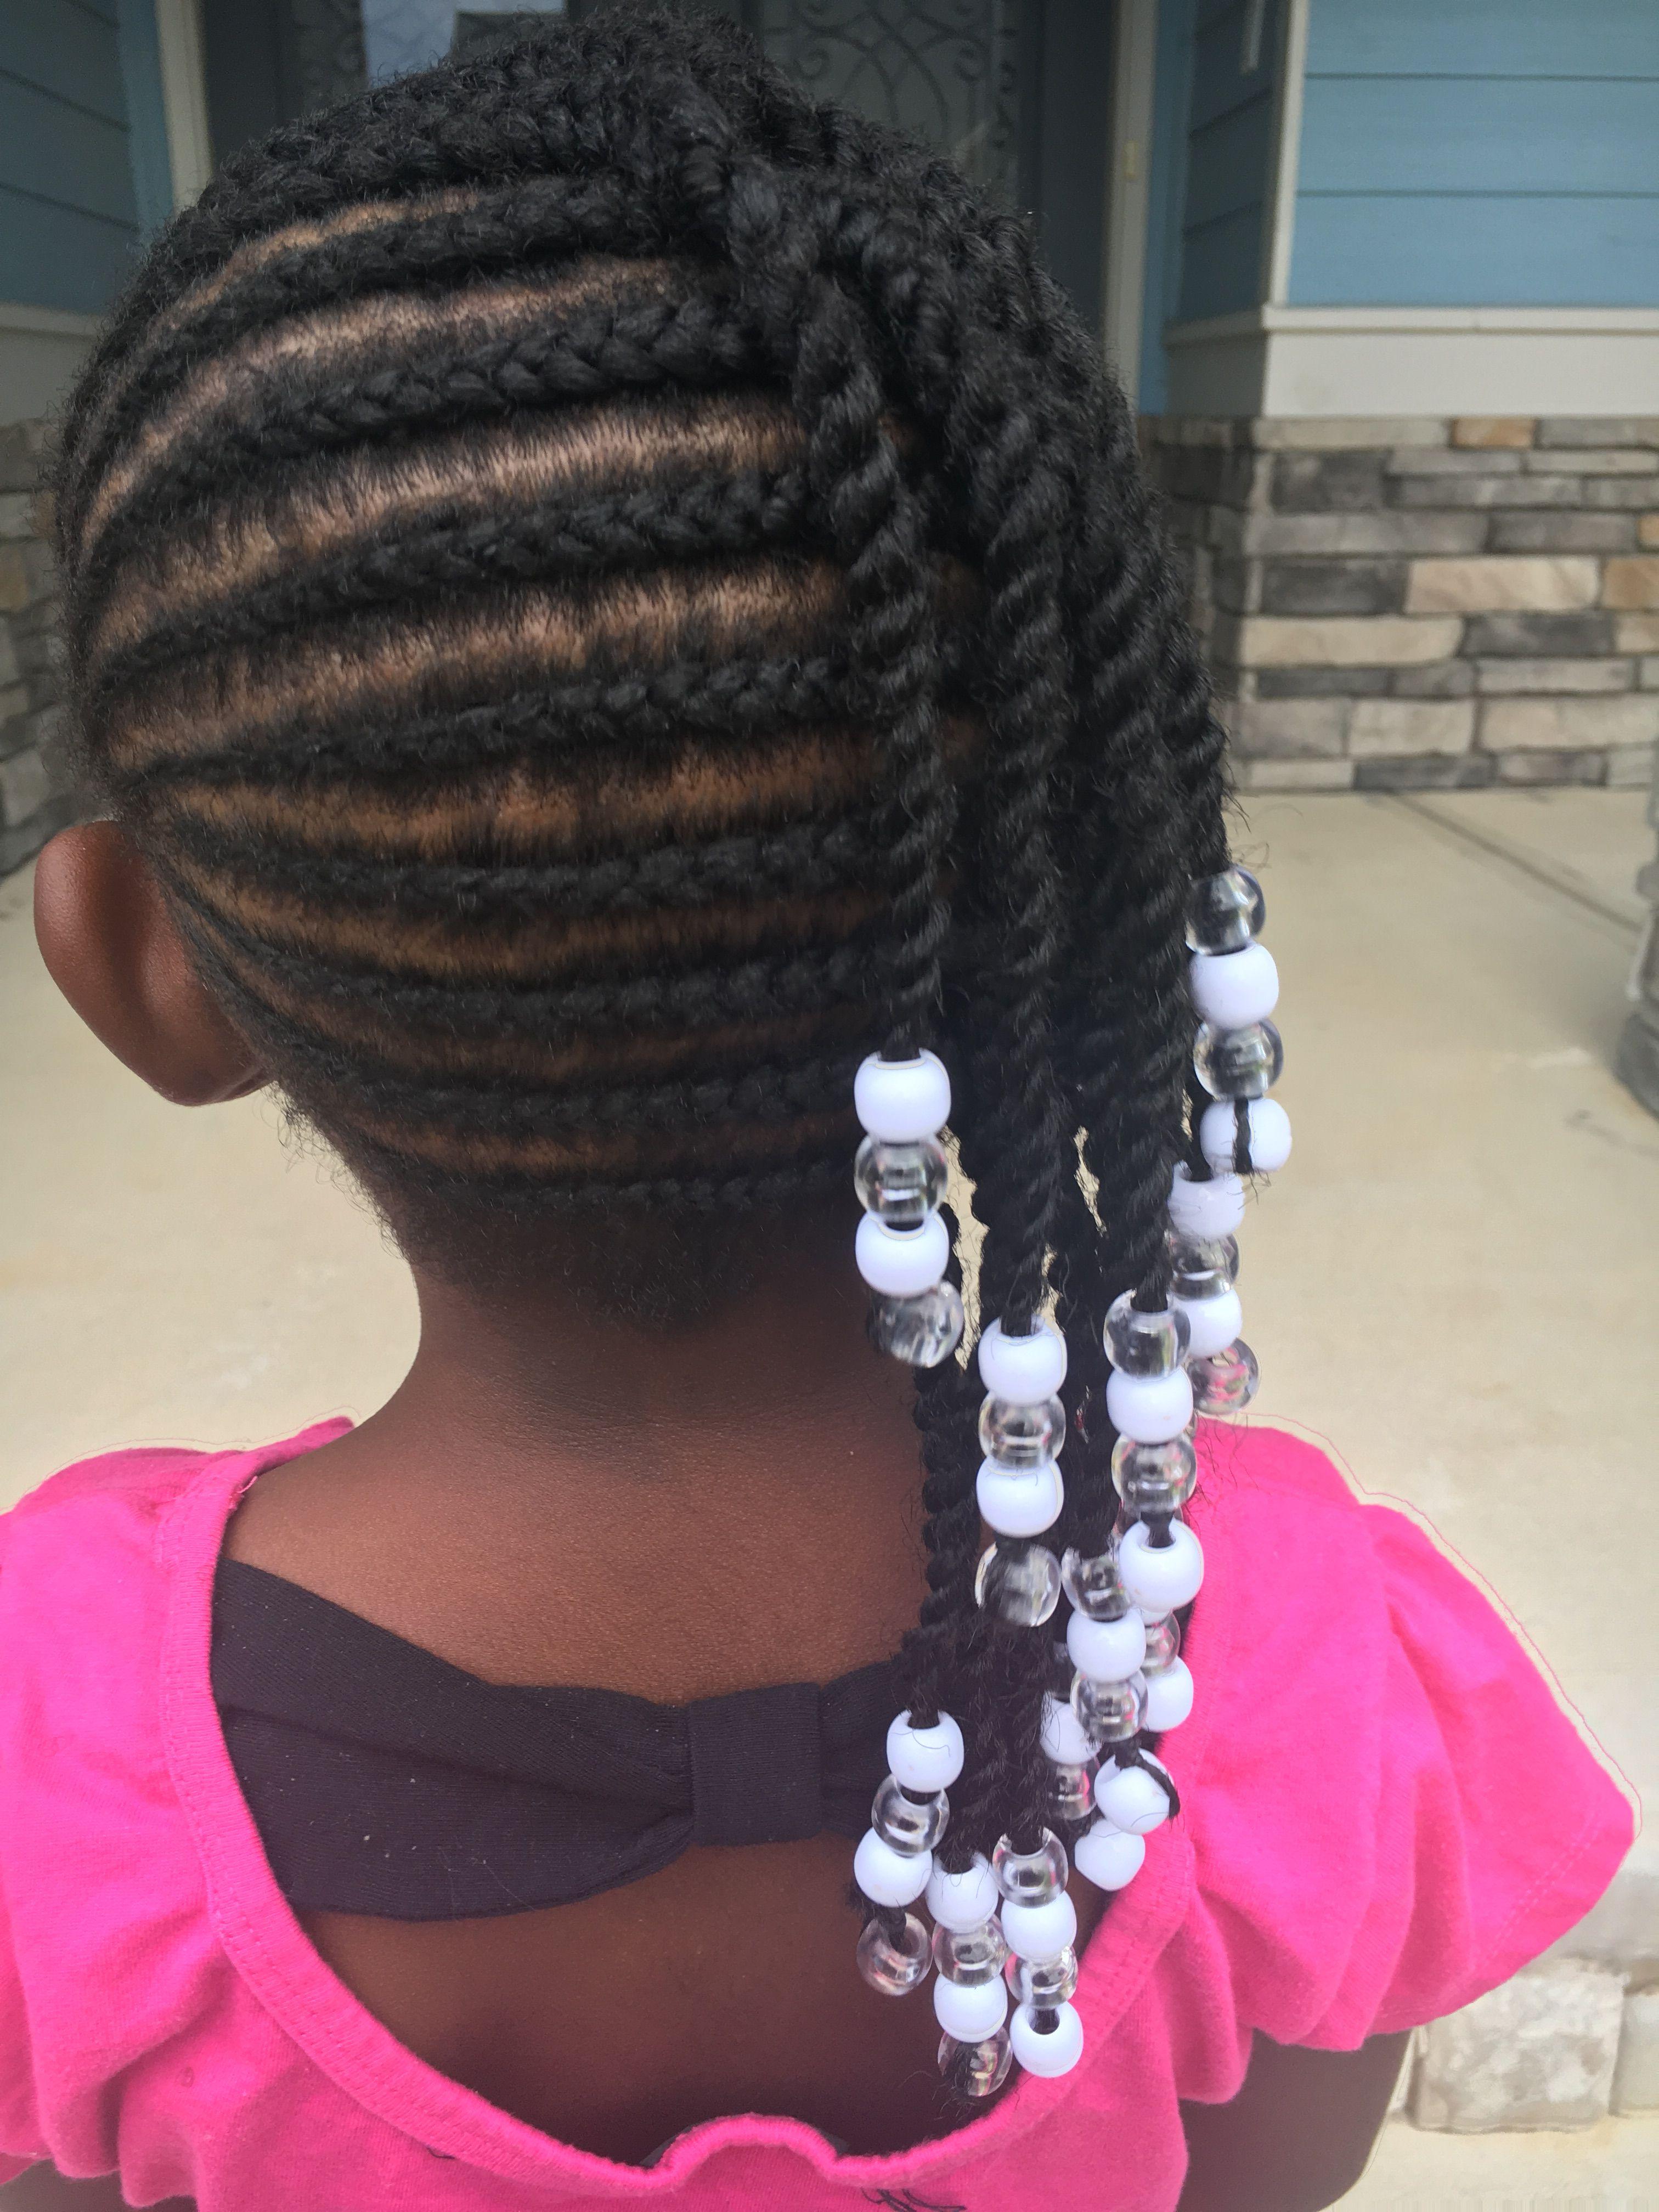 So cute hair ideas pinterest kid hairstyles hair style and